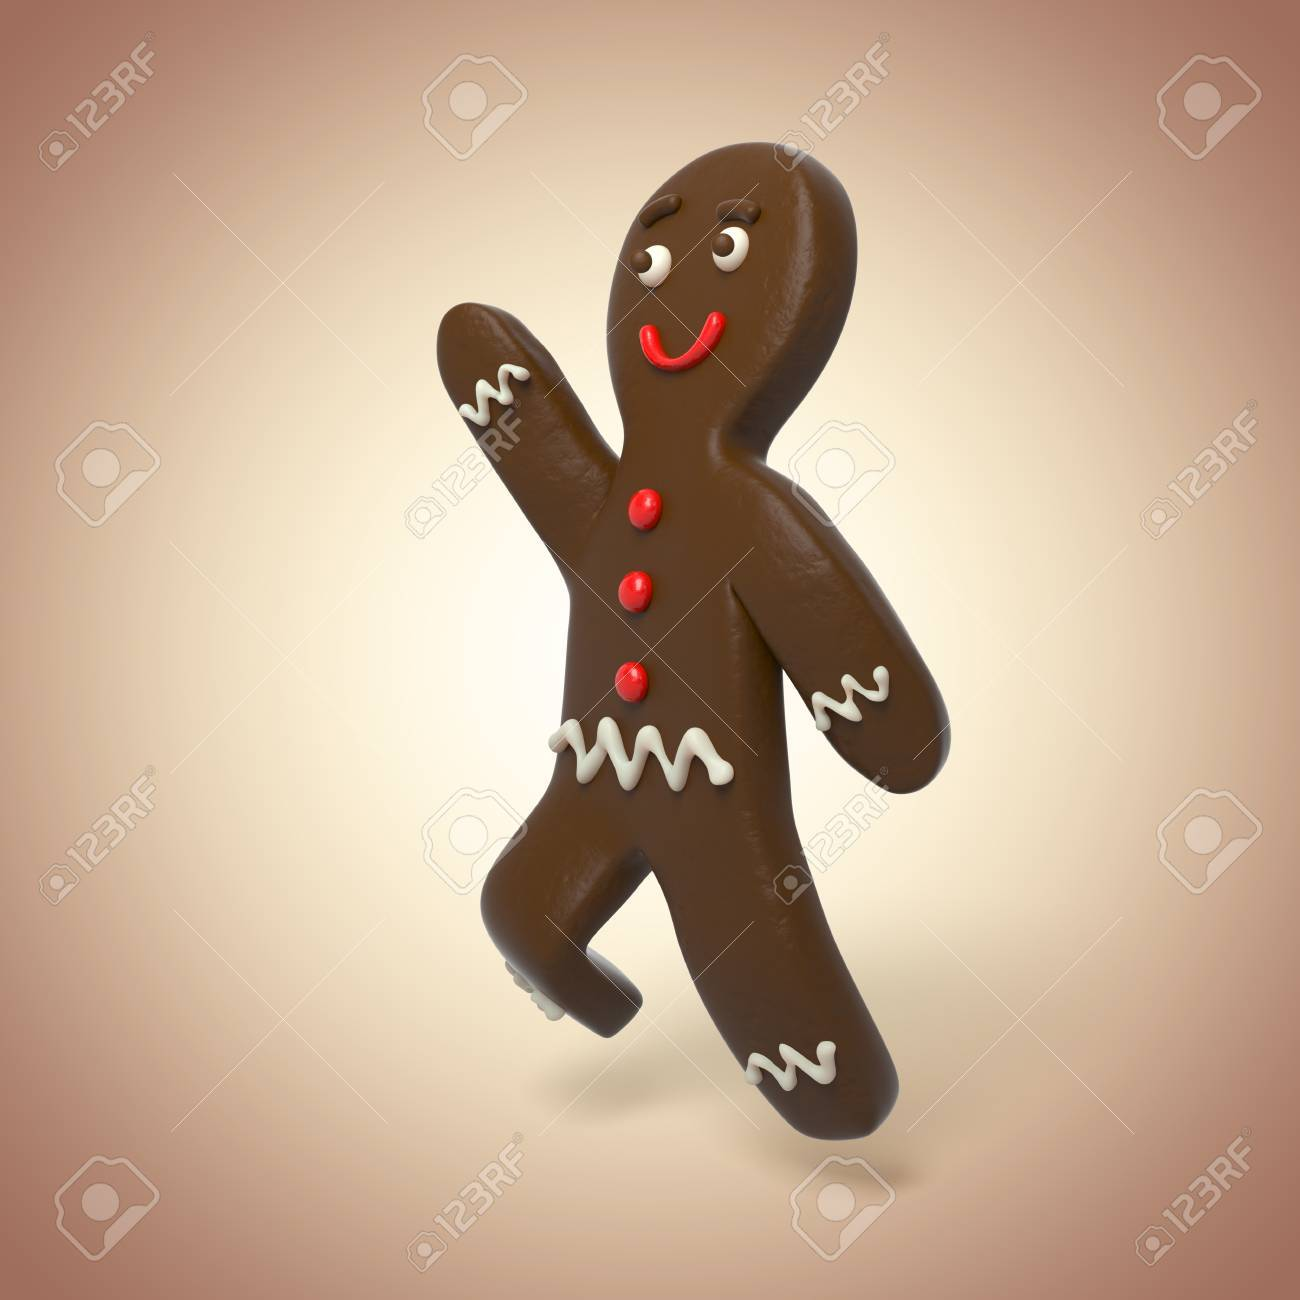 3d Chocolate Gingerbread Man Running Cartoon Character